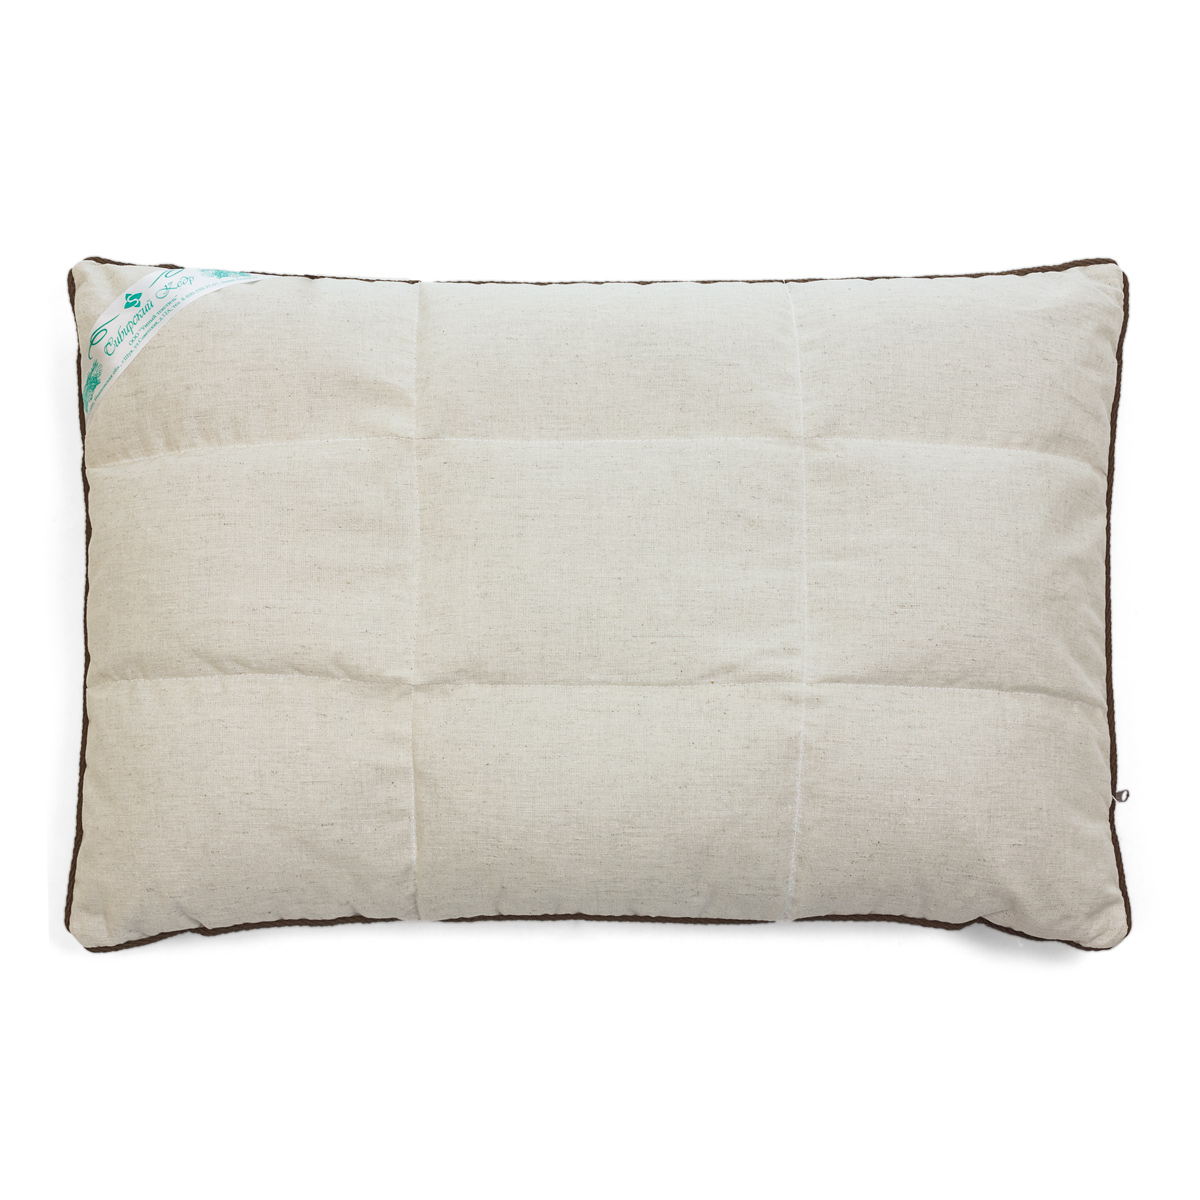 Подушка  Байкальская  р. 40х60 - Текстиль для здоровья артикул: 26454